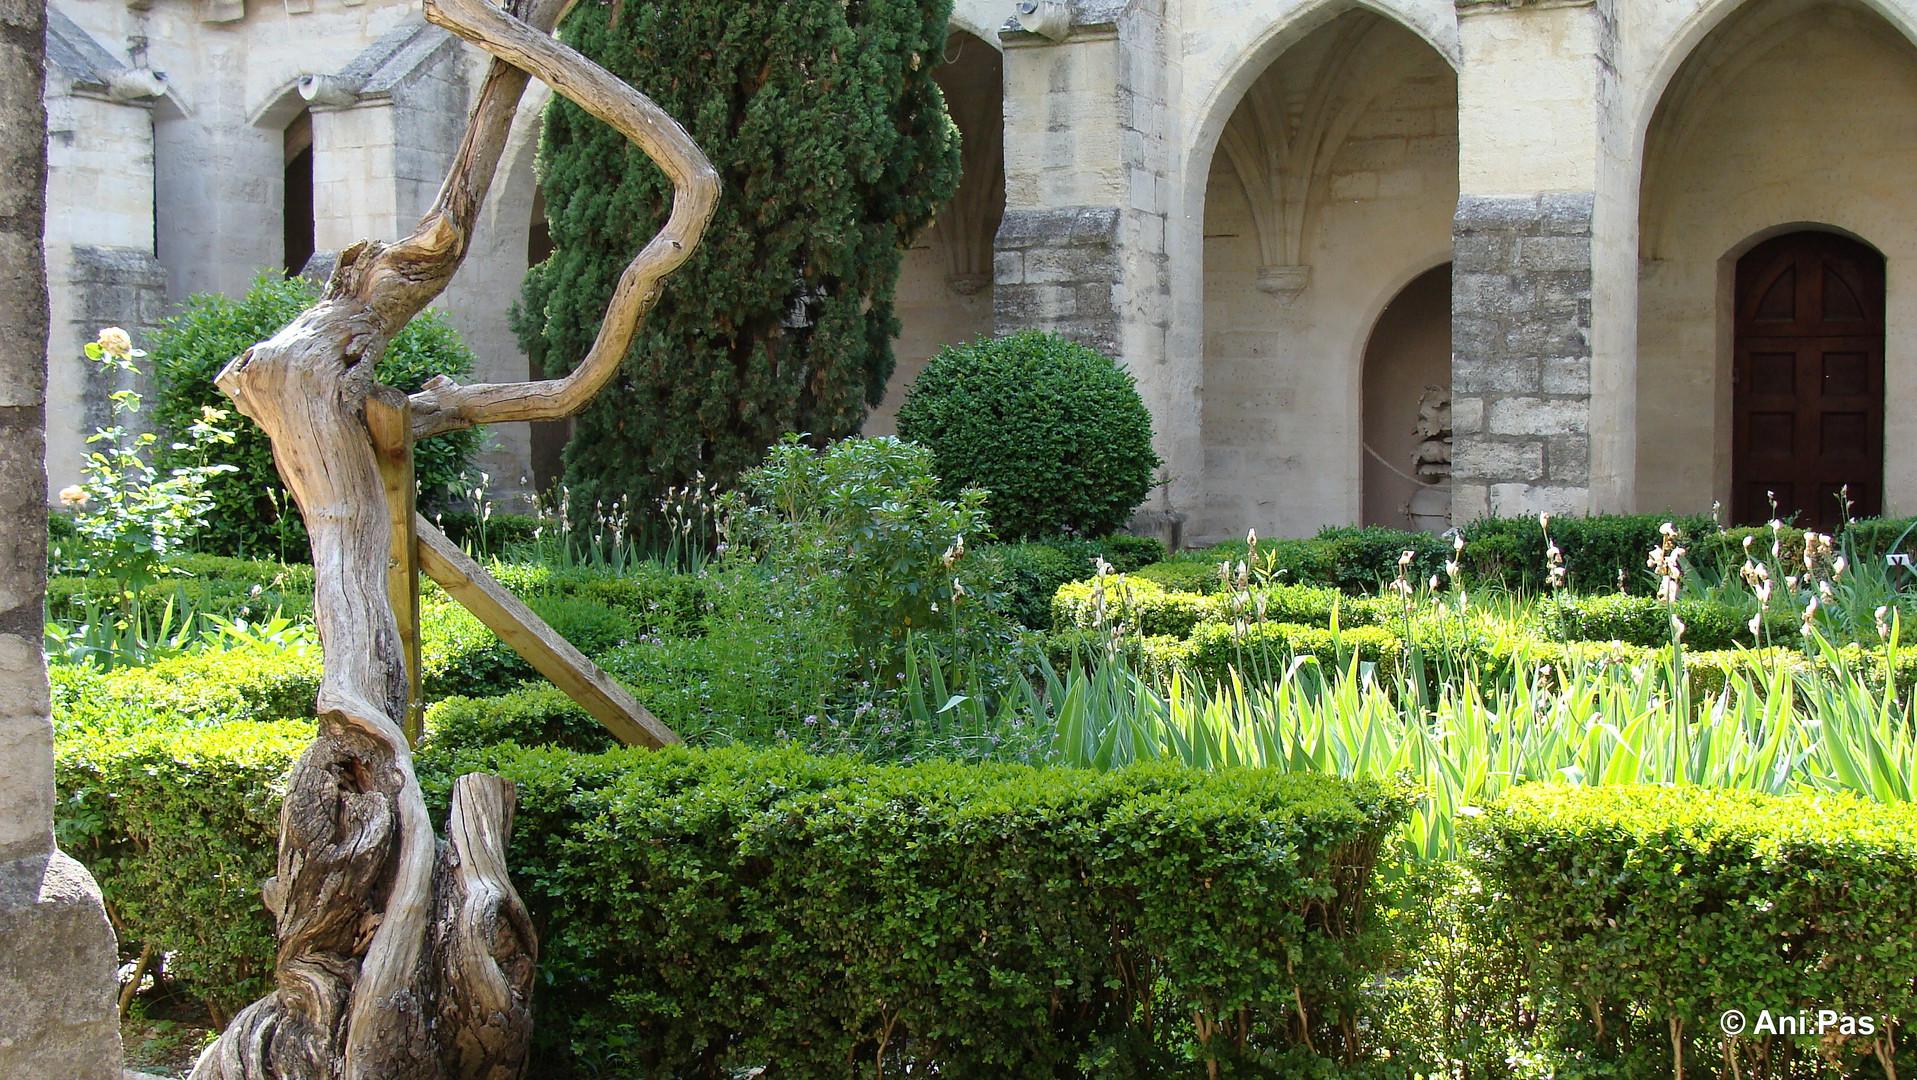 Kreuzgang II, La Chartreuse, Villeneuve-les-Avignon, Provence